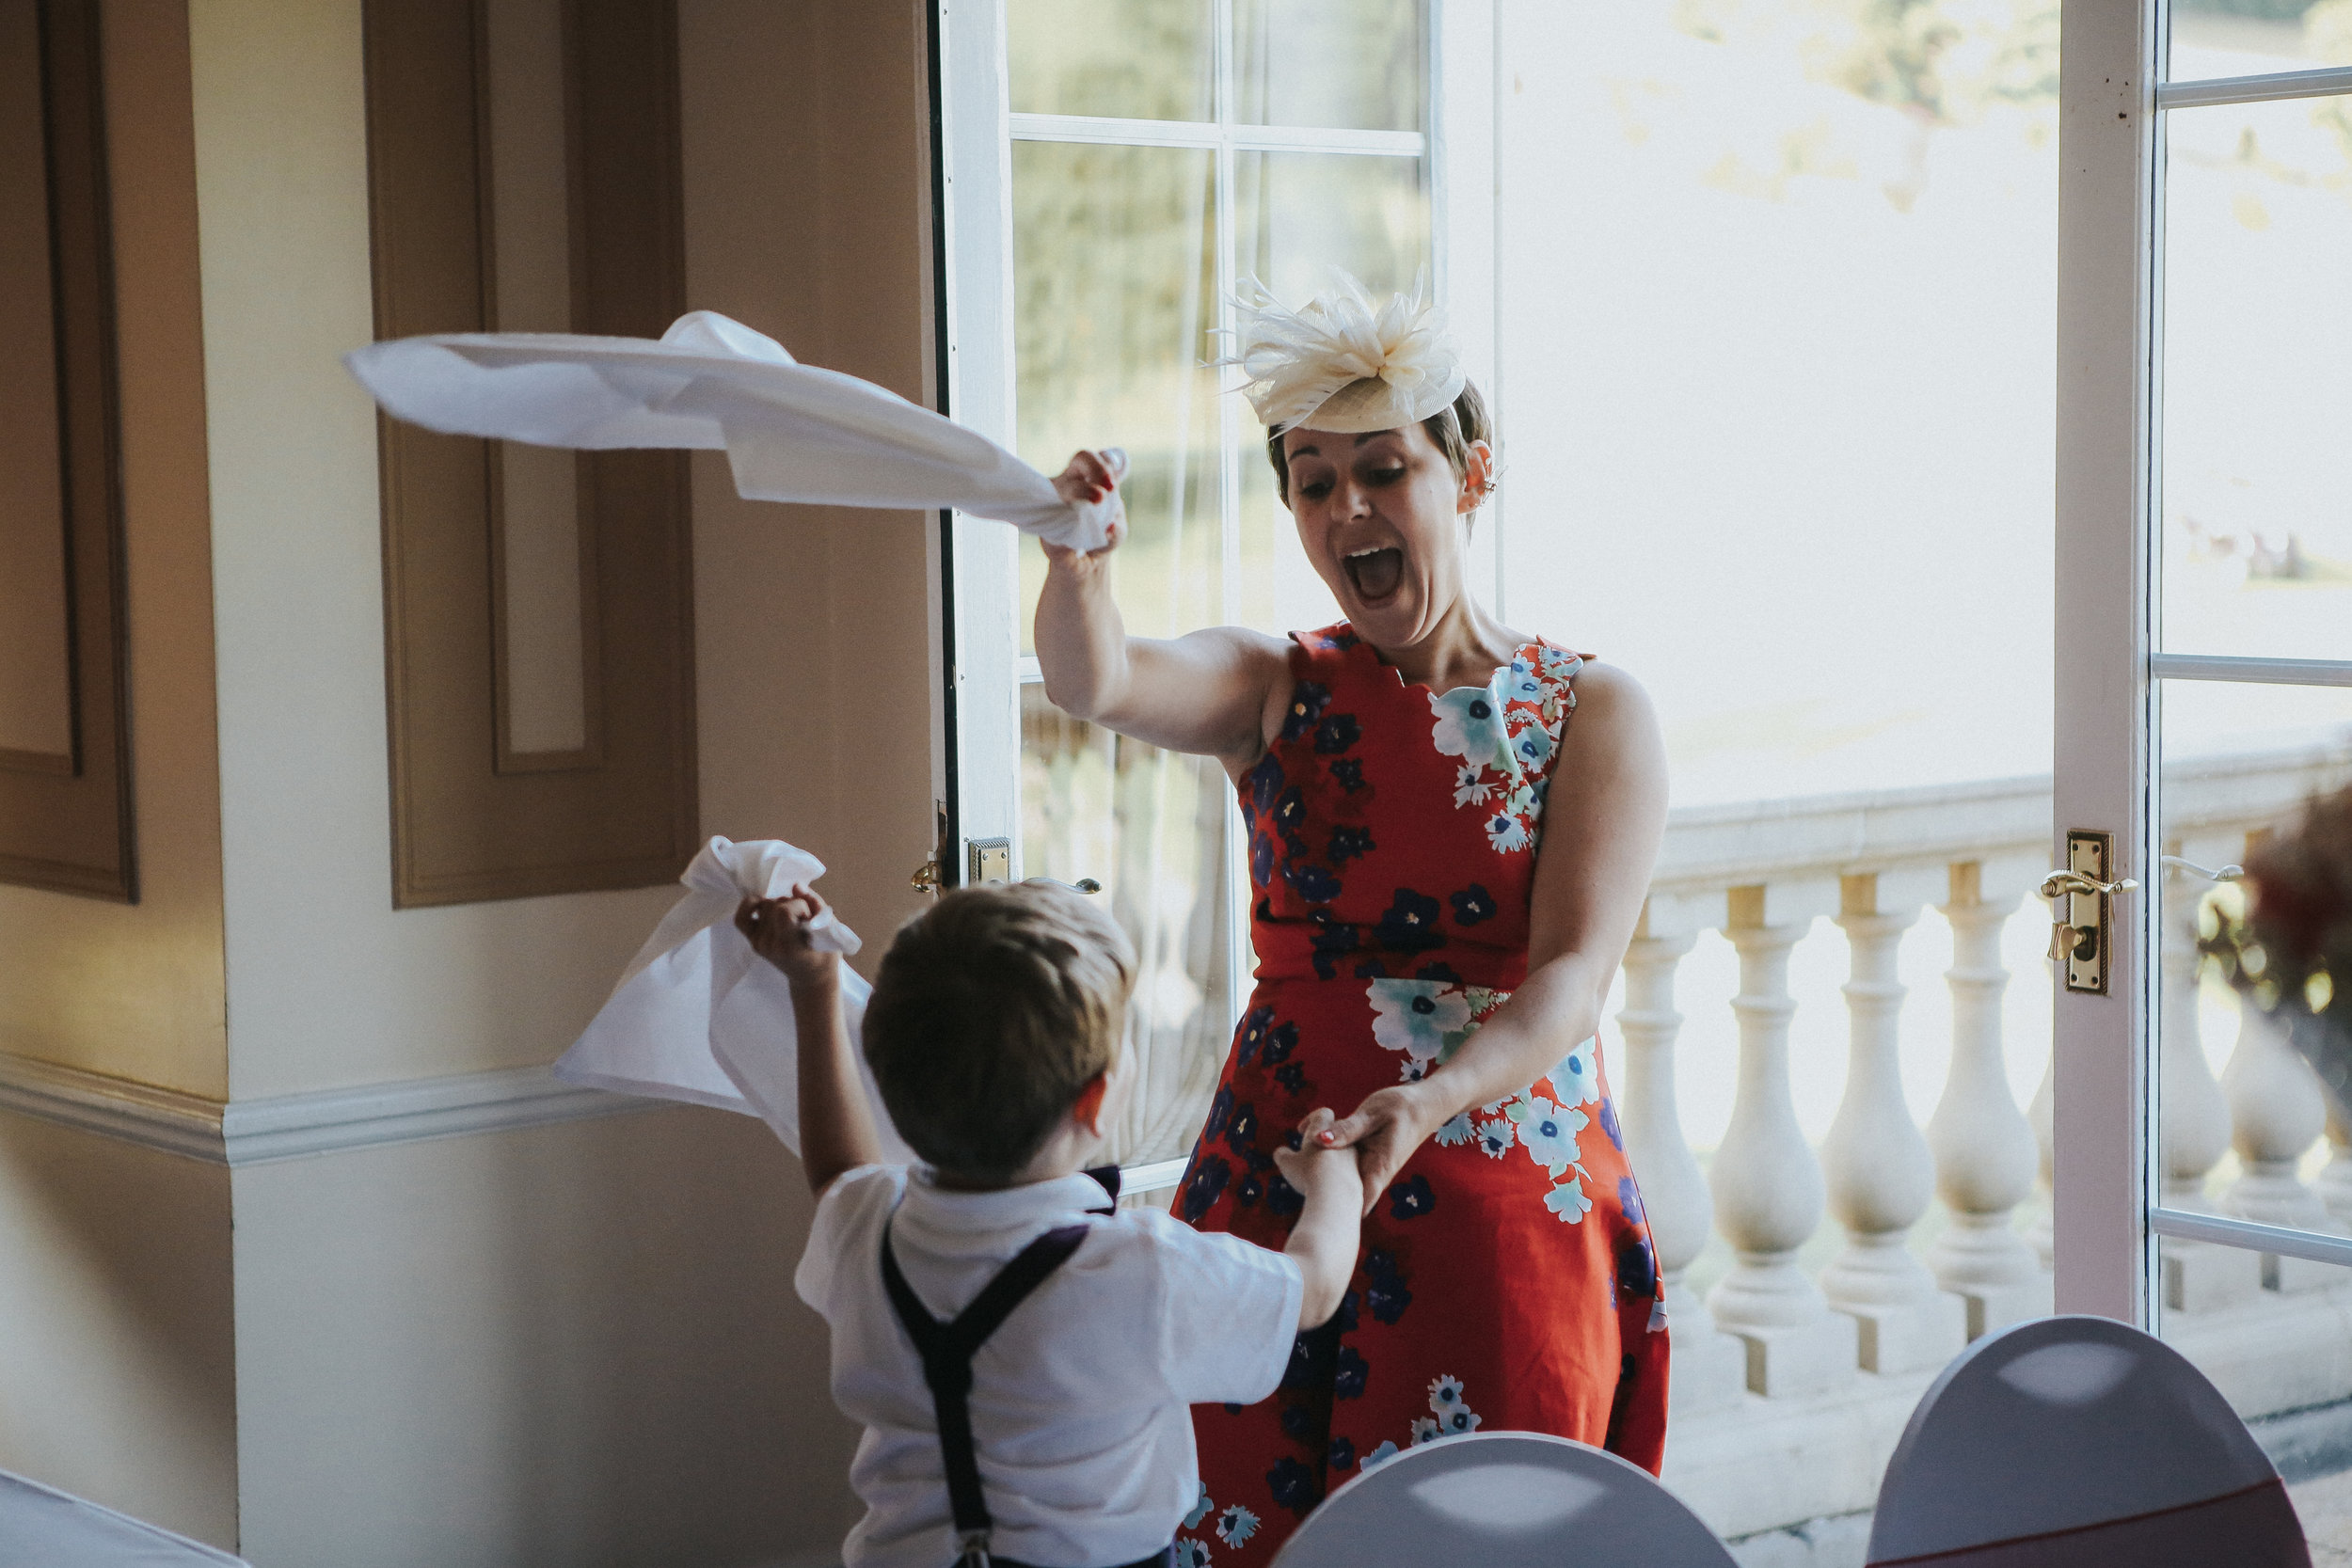 reigate-surrey-london-wedding-photography-group-formal-shot-reception-woldingham-golf-club-91